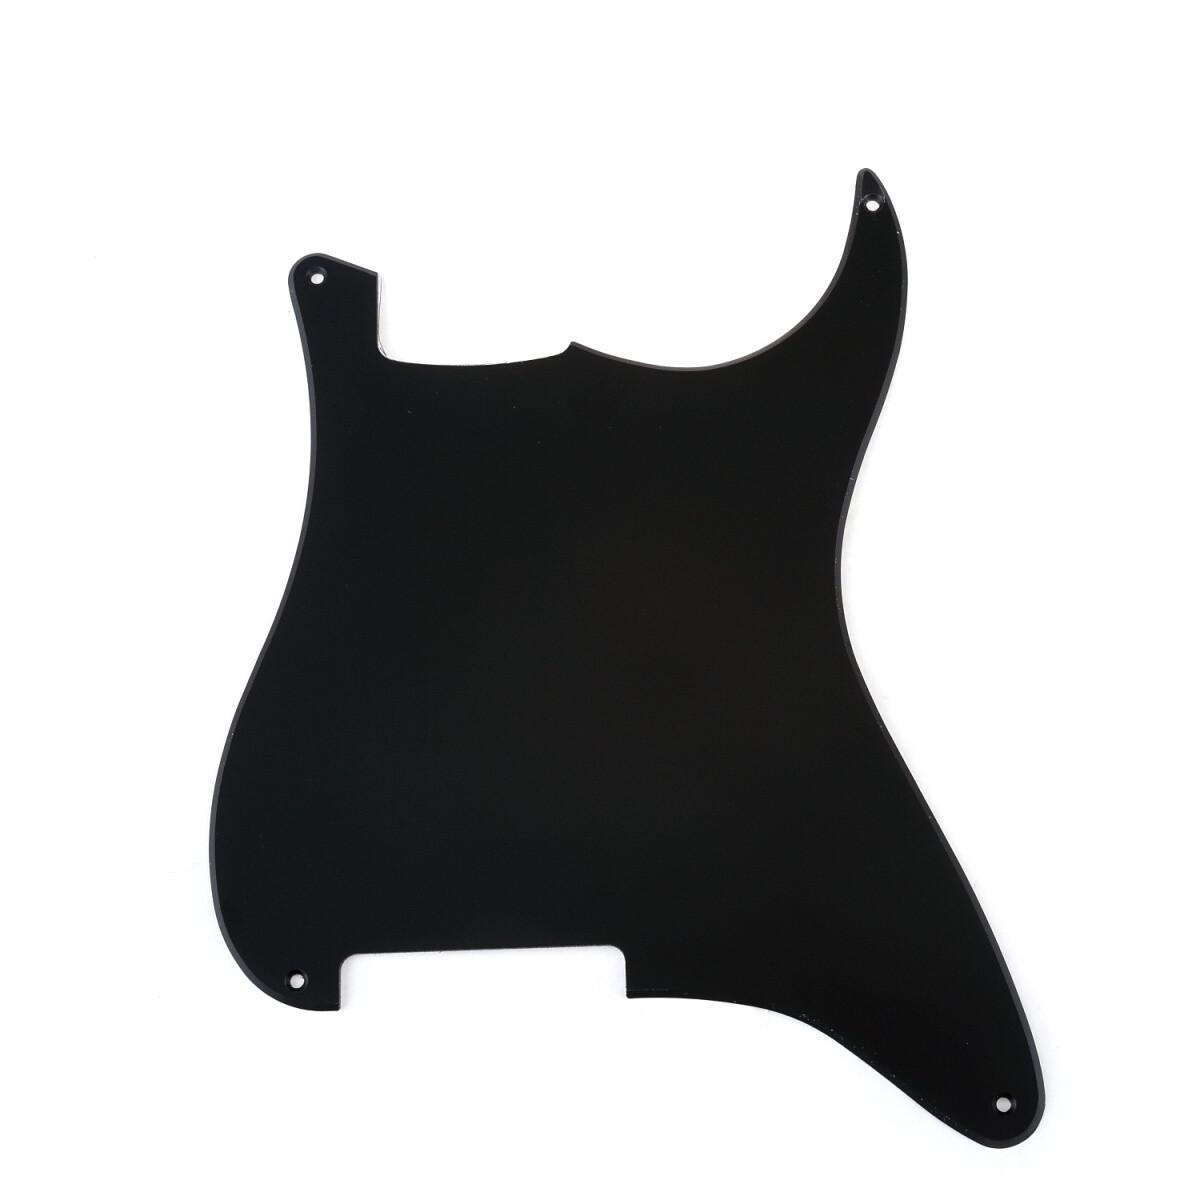 Brio Blank 4 hole outline pickguard for Strat®, 1 Ply Matte Black